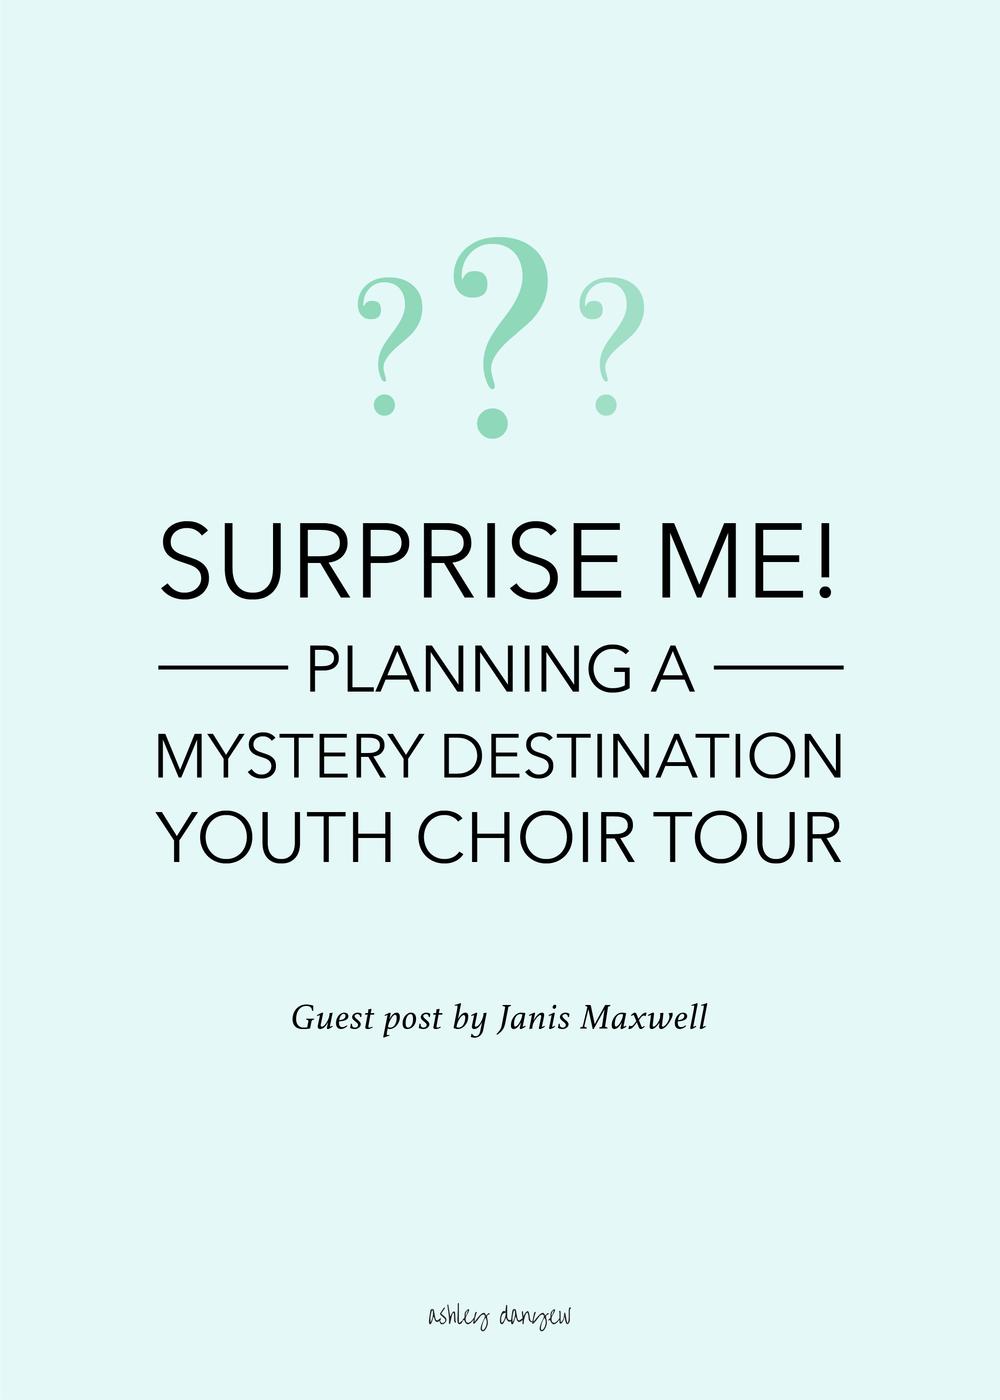 Surprise Me! Planning a Mystery Destination Youth Choir Tour-07.png